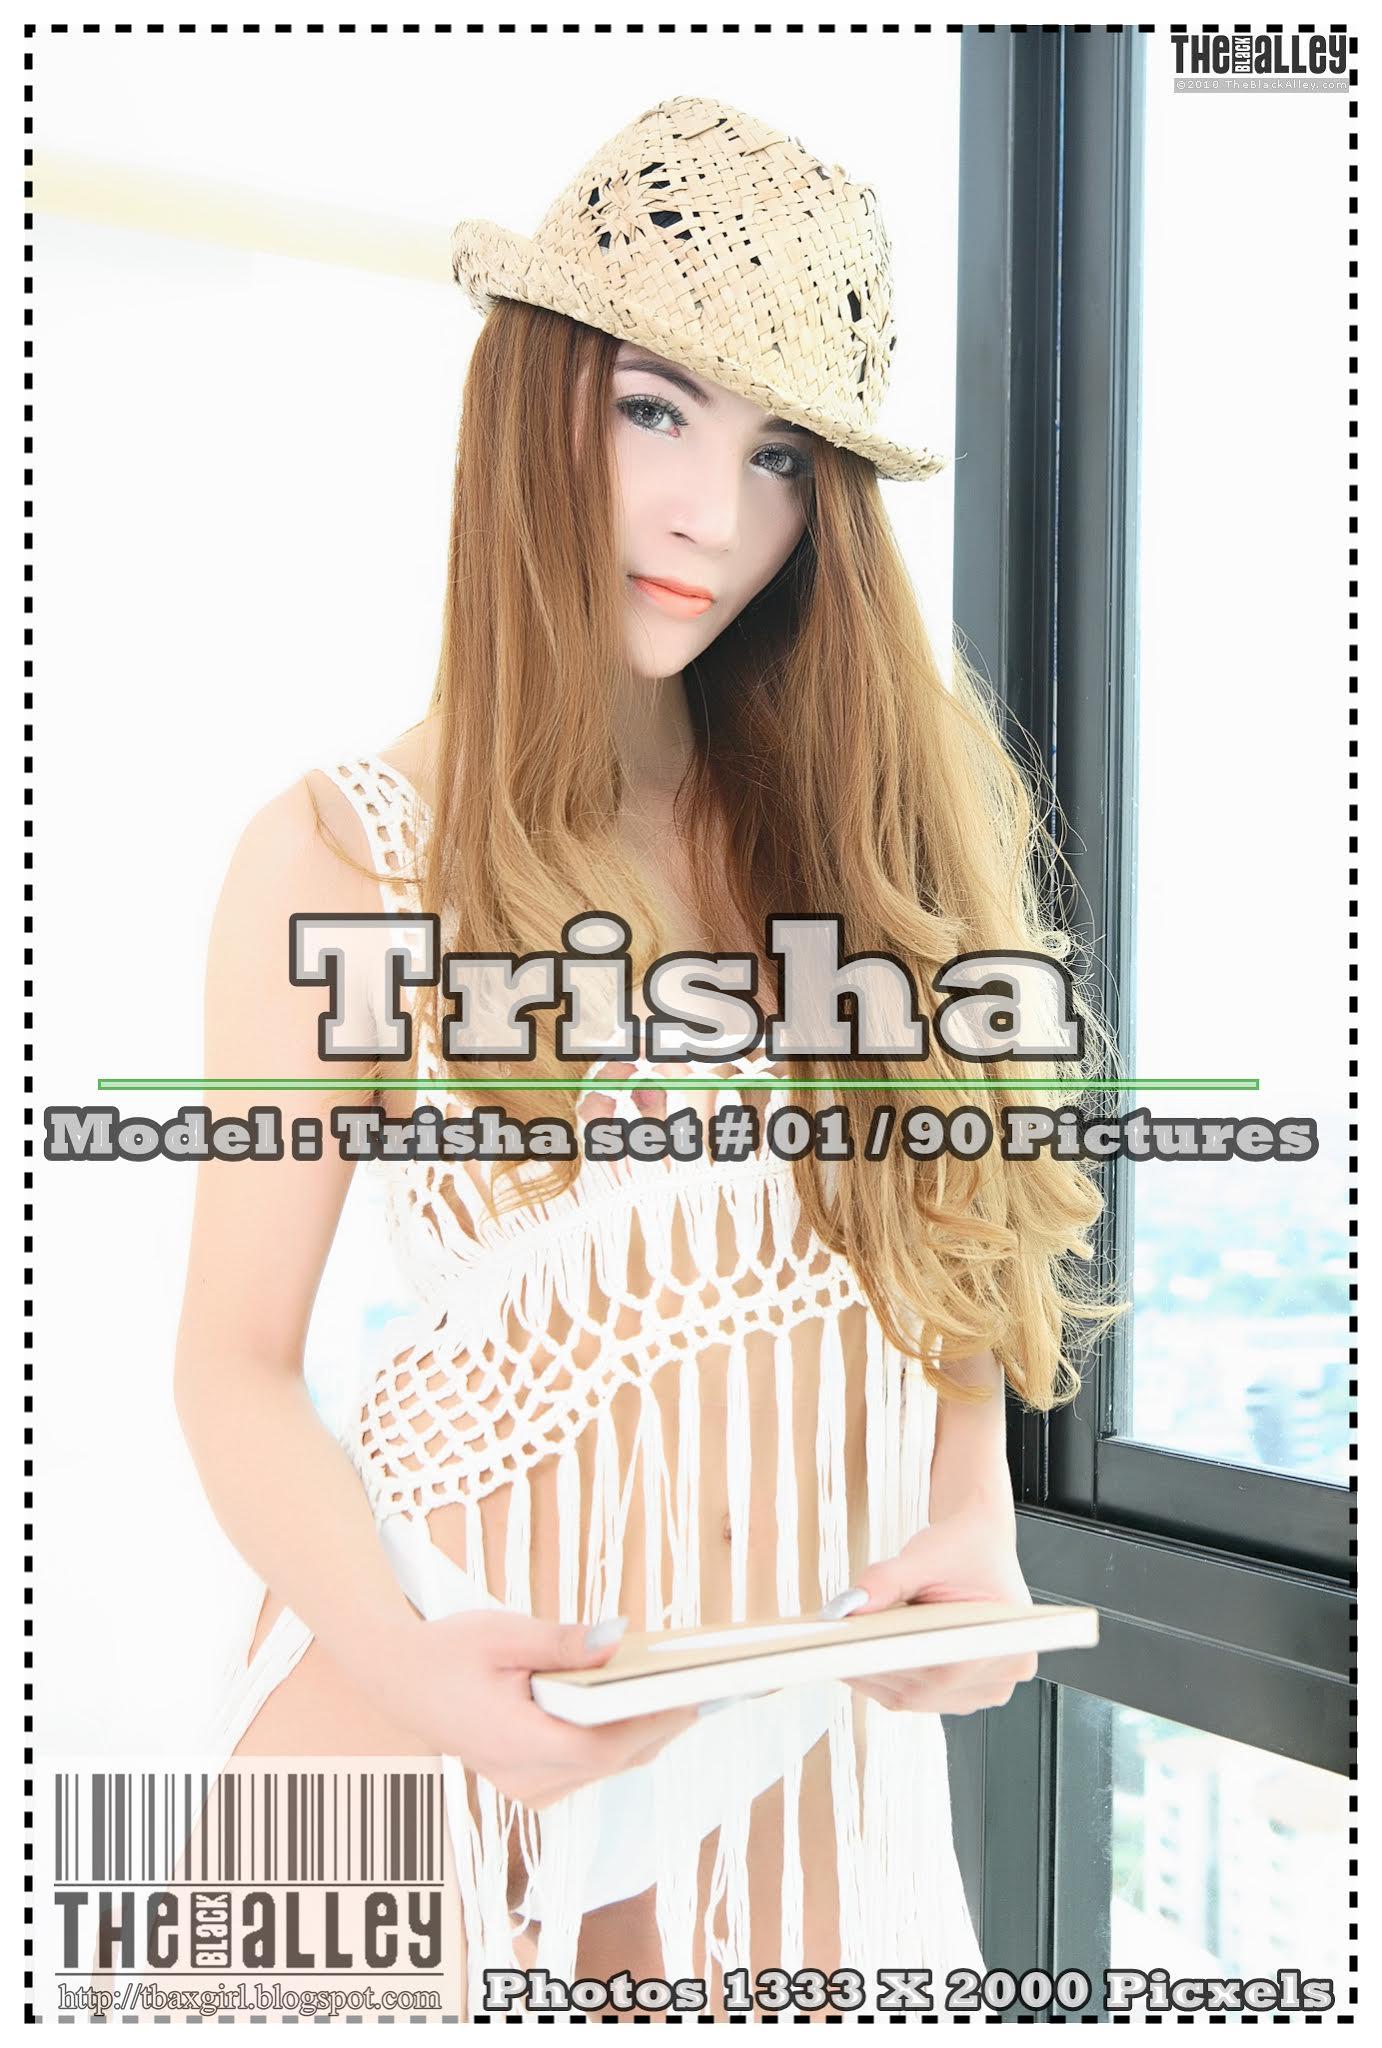 litu 100 archives: [TheBlackAlley] Trisha Set 01